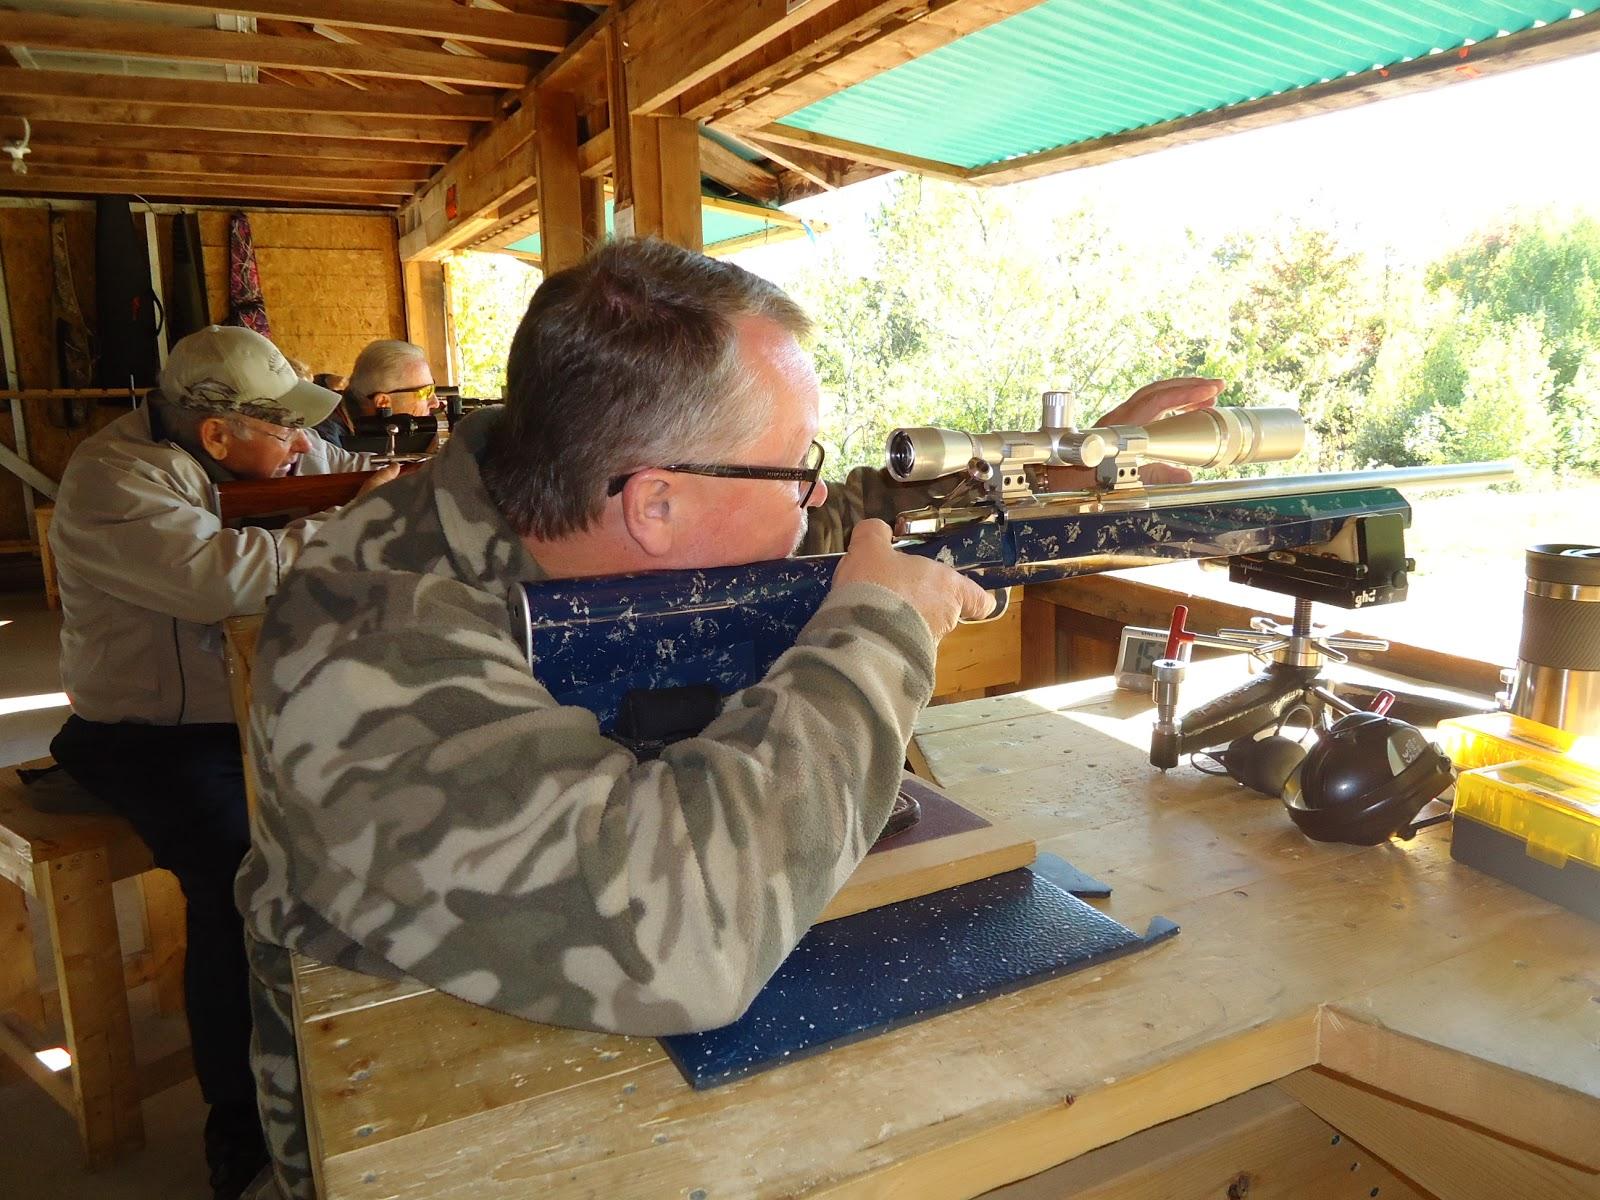 benchrest rest airgun airguns salem tag arizona regional blog bench of